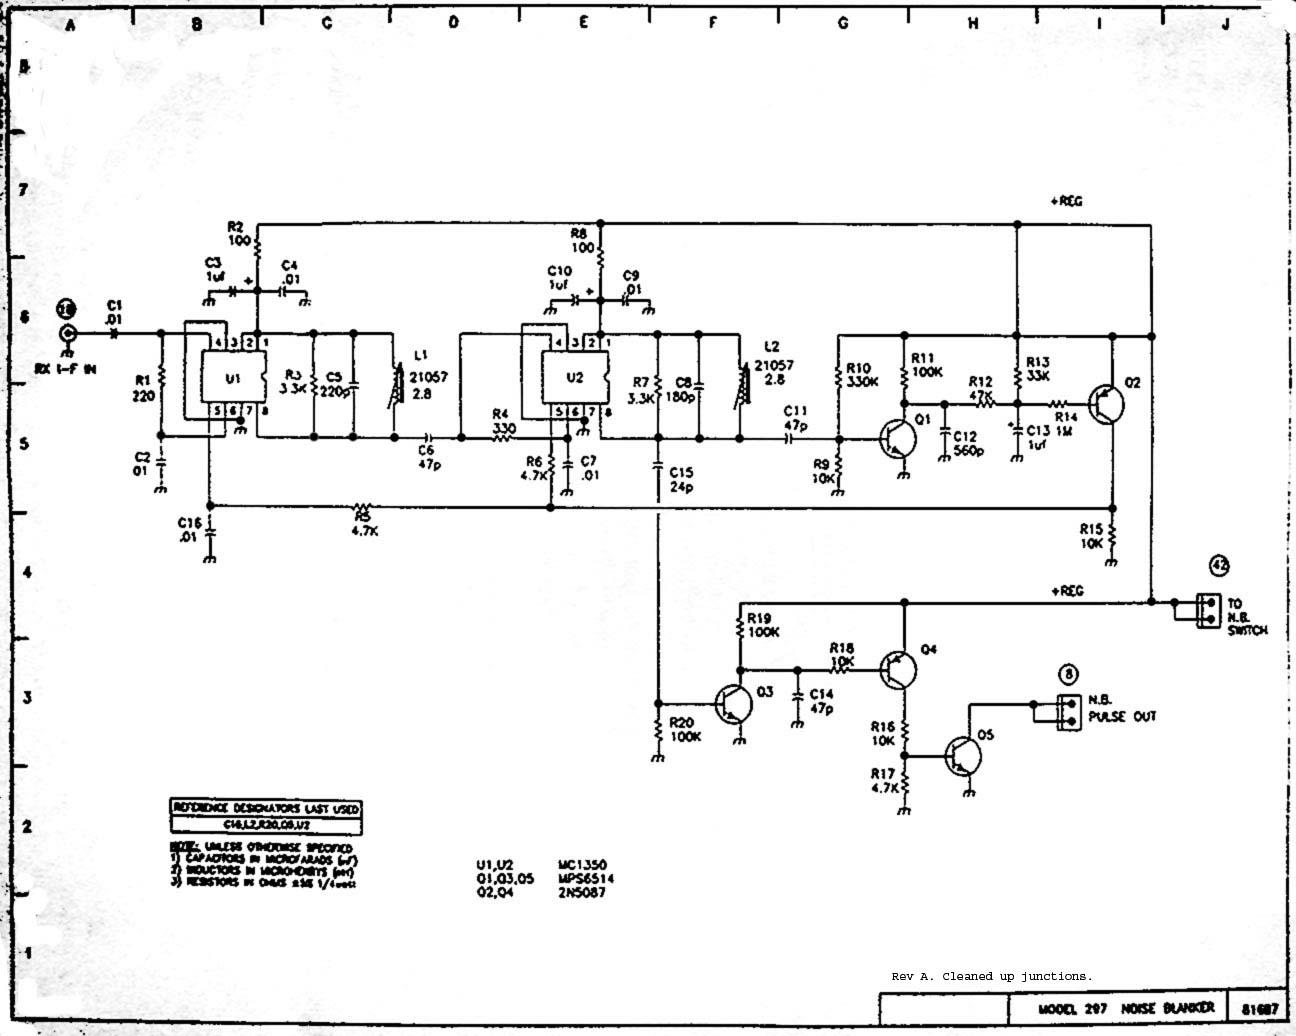 hyosung gv250 wiring diagram triumph daytona 600 wiring diagram wiring diagram   elsalvadorla 2009 hyosung gv250 wiring diagram Hyosung GV250 Accessories